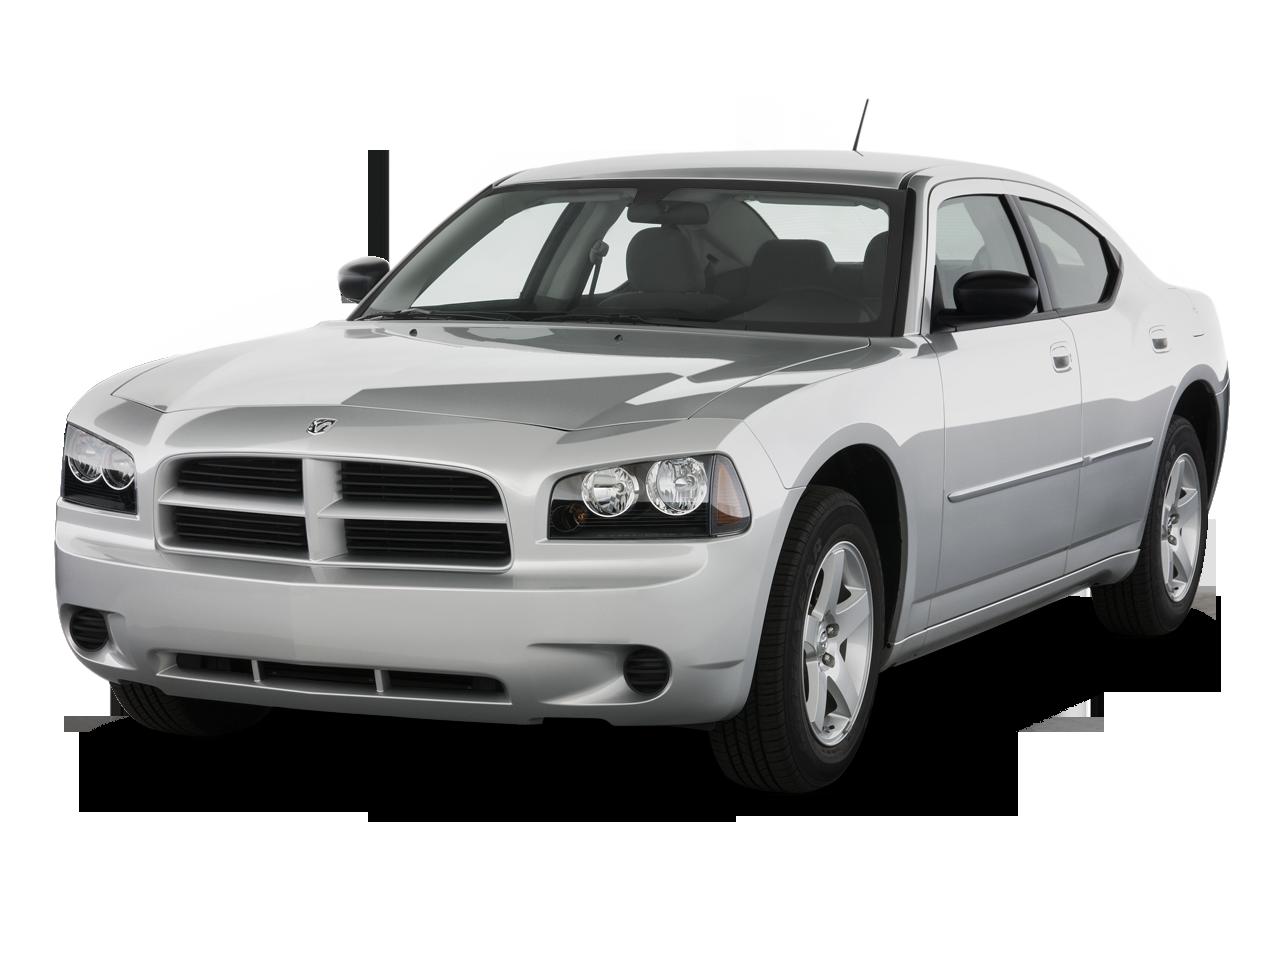 2009 dodge charger srt8 dodge sport coupe review automobile magazine. Black Bedroom Furniture Sets. Home Design Ideas